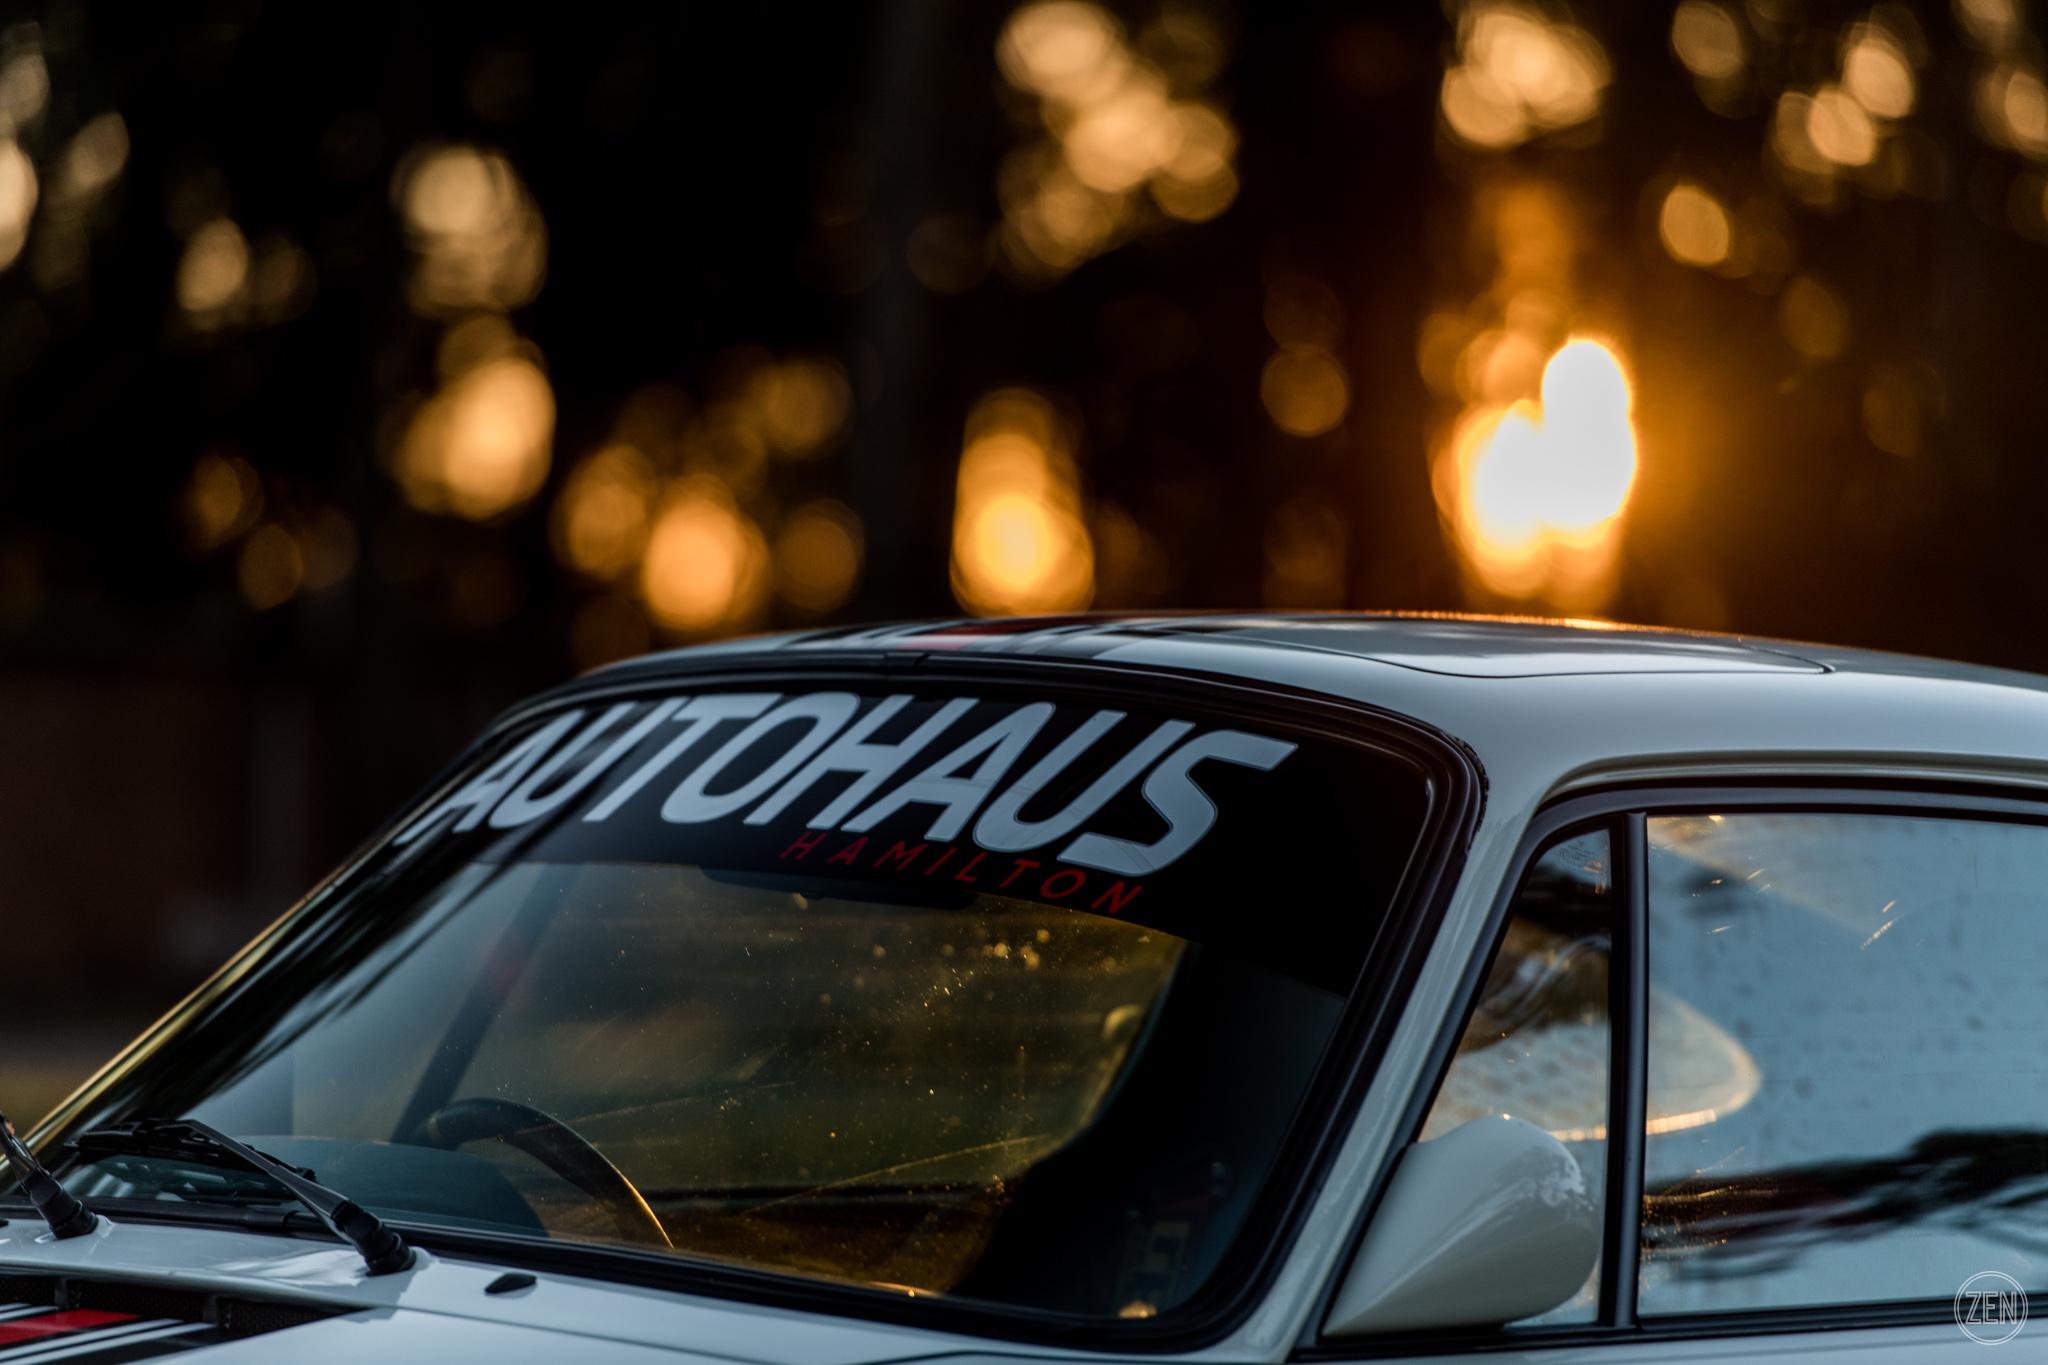 2019-07-21 - Autohaus Porches & Coffee 003